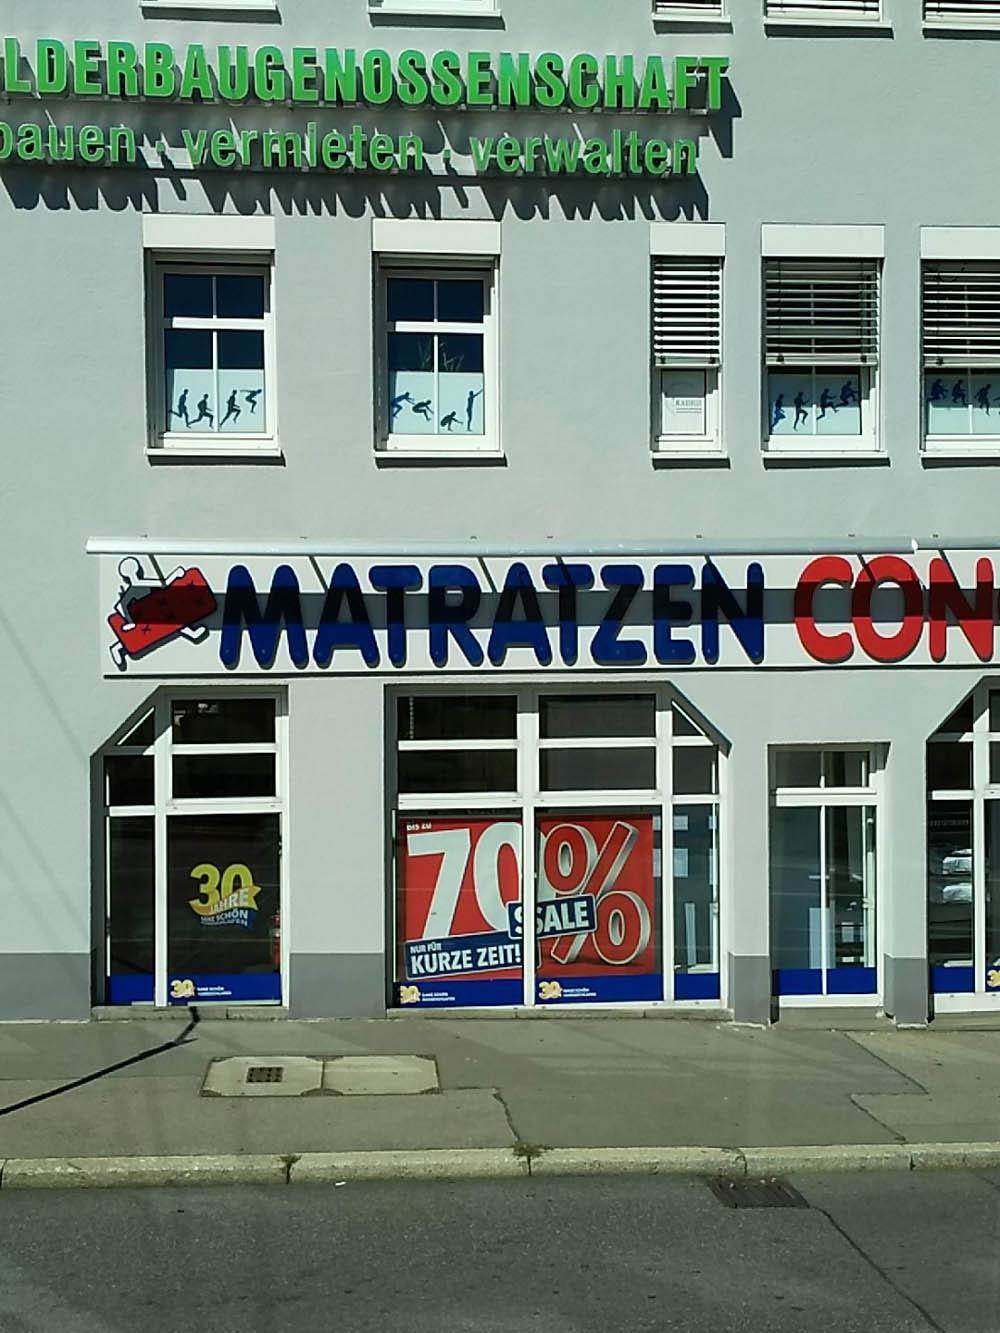 Hallo Vaihingen, hallo Matratzen Concord.